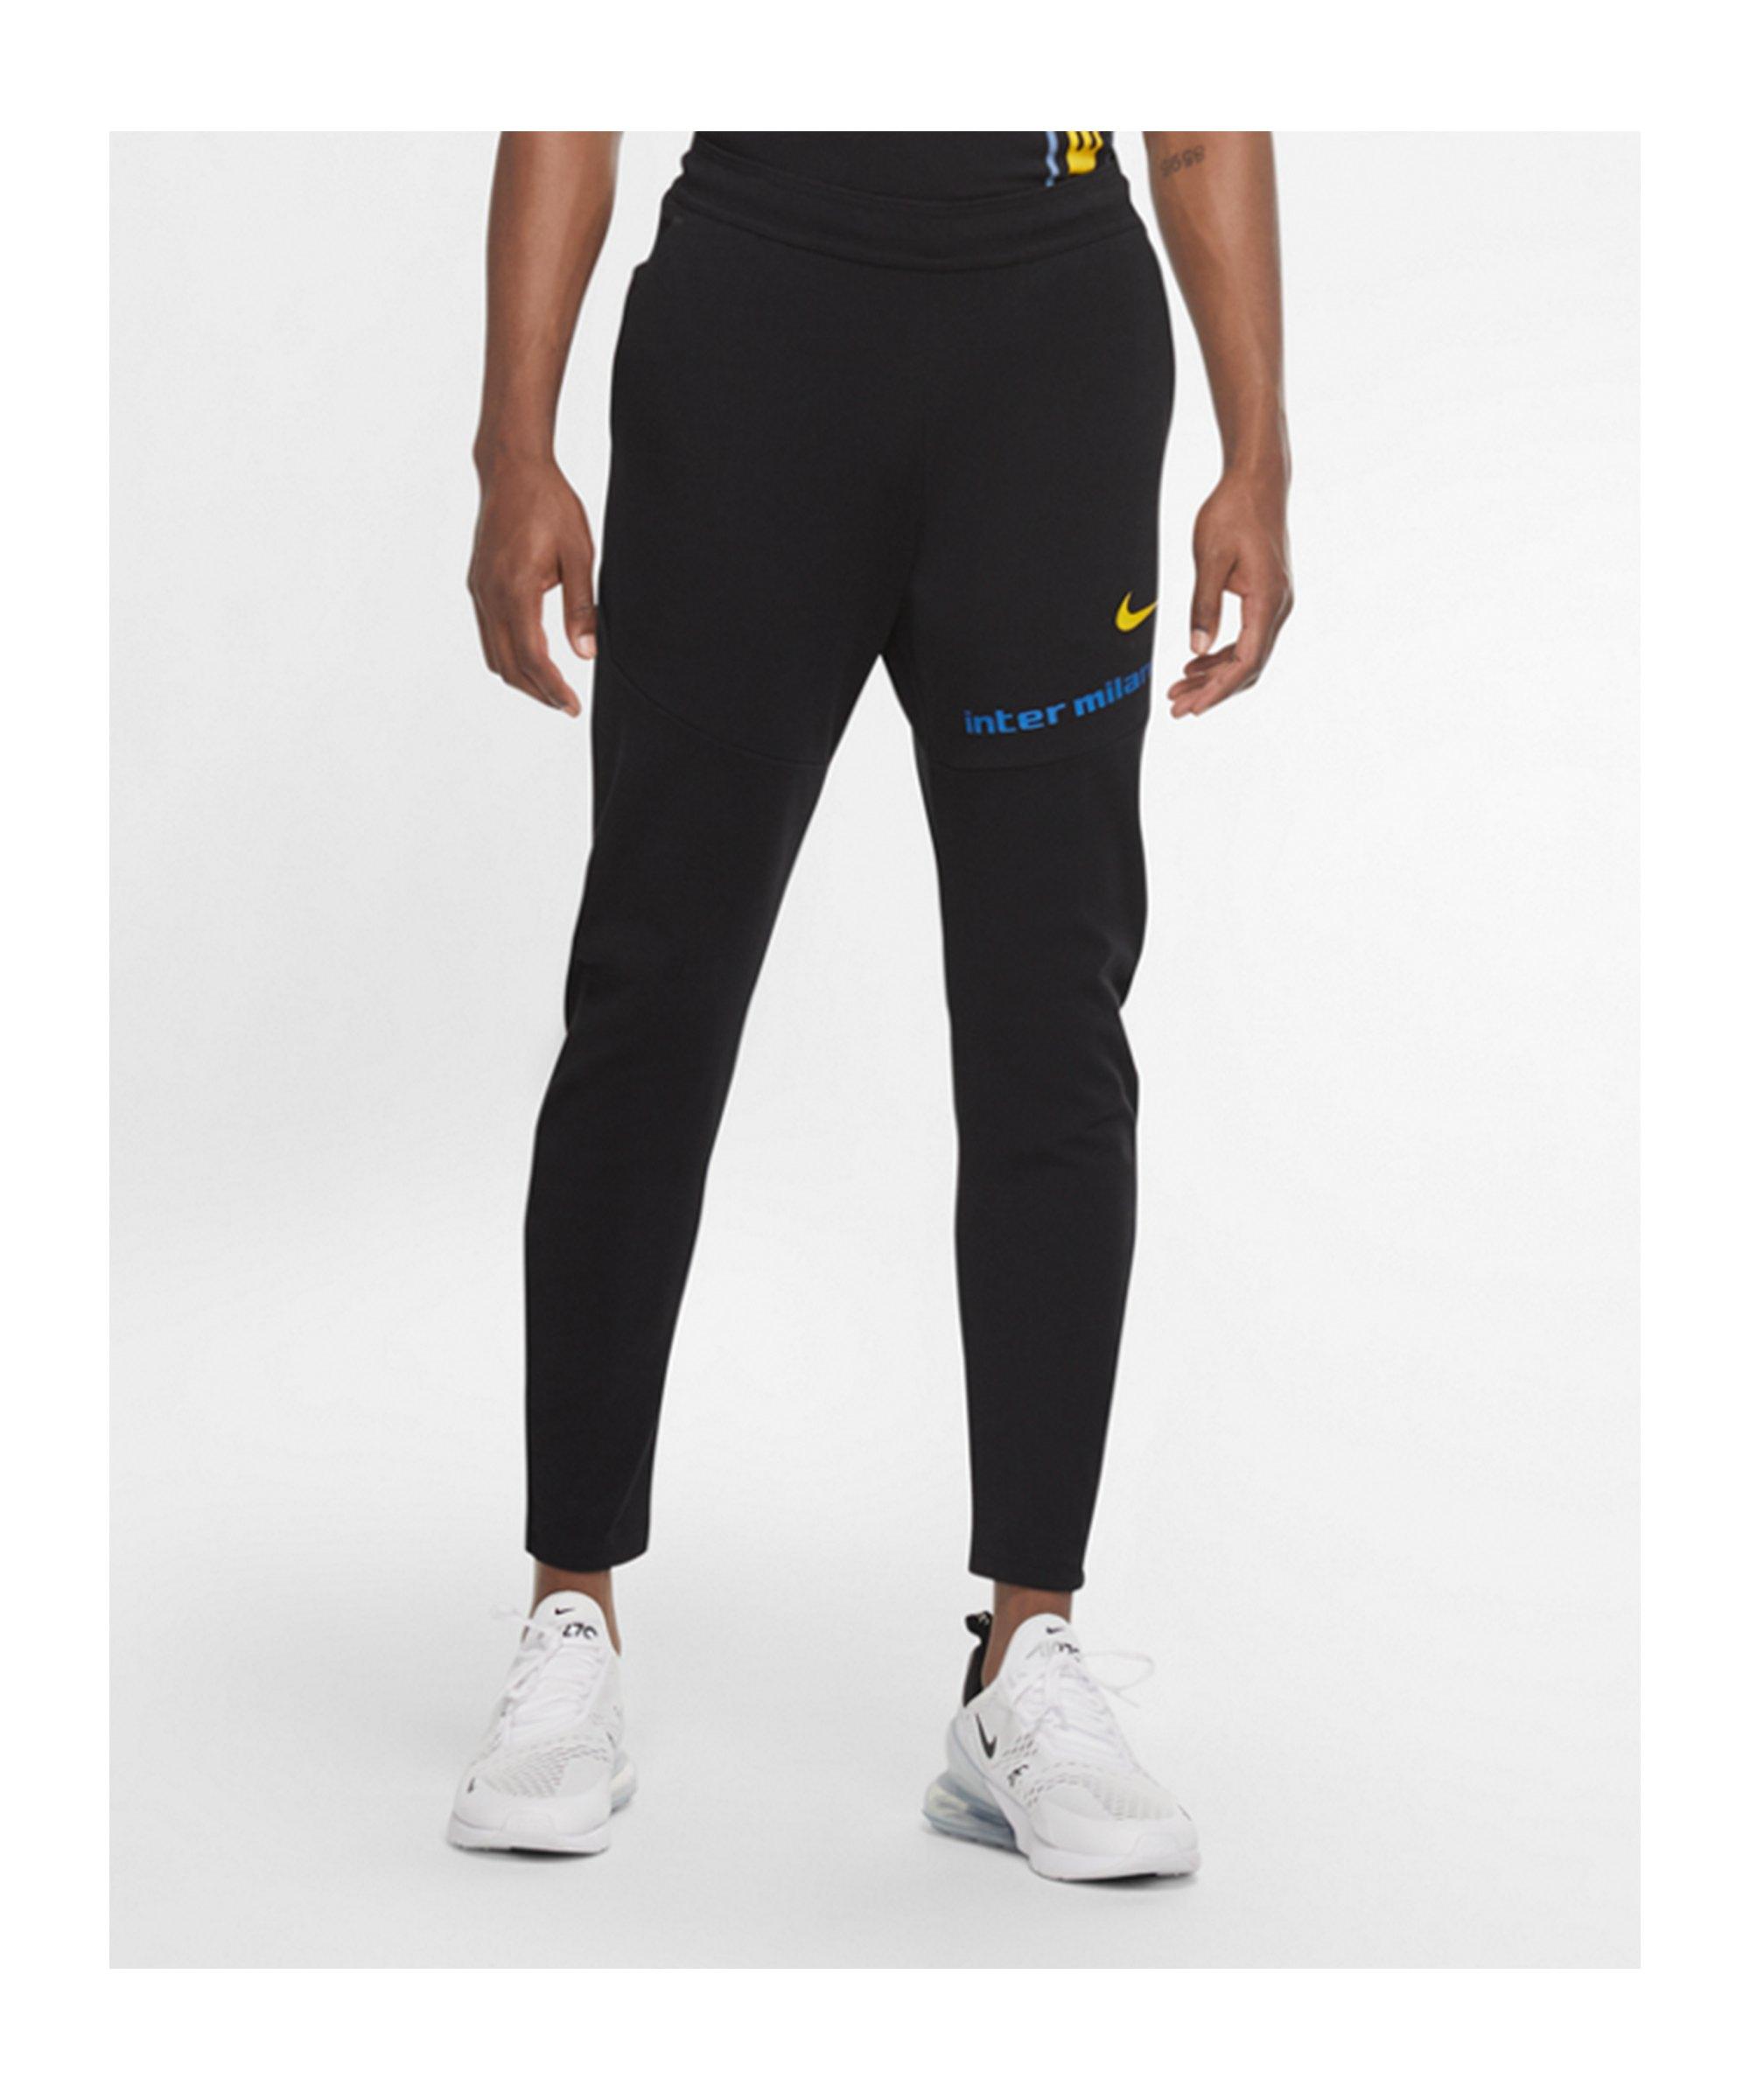 Nike Inter Mailand Tech Pack Trainingshose CL F010 - schwarz